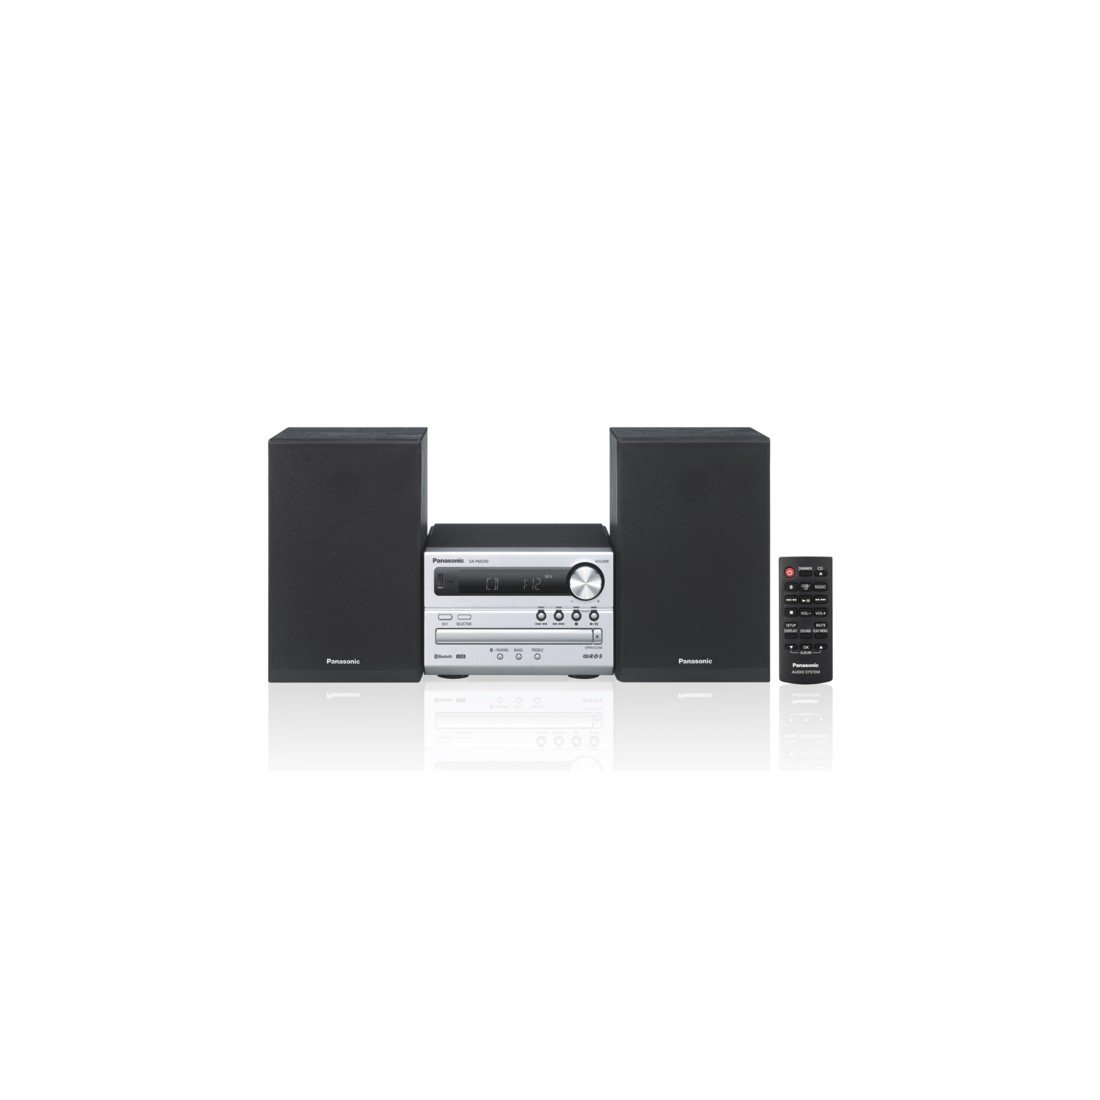 Panasonic SC PMEC S Microcadena de W x W FM CD R